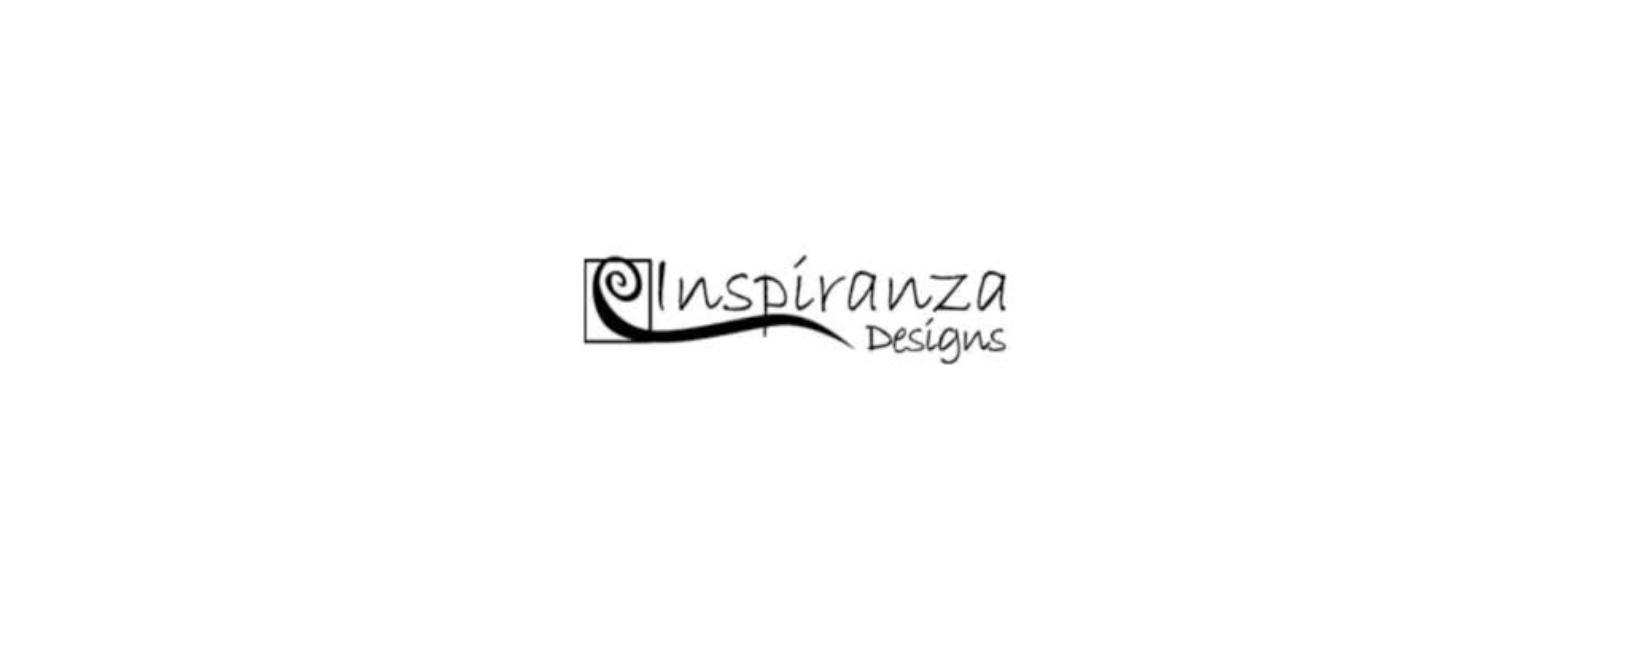 Inspiranza Discount Code 2021